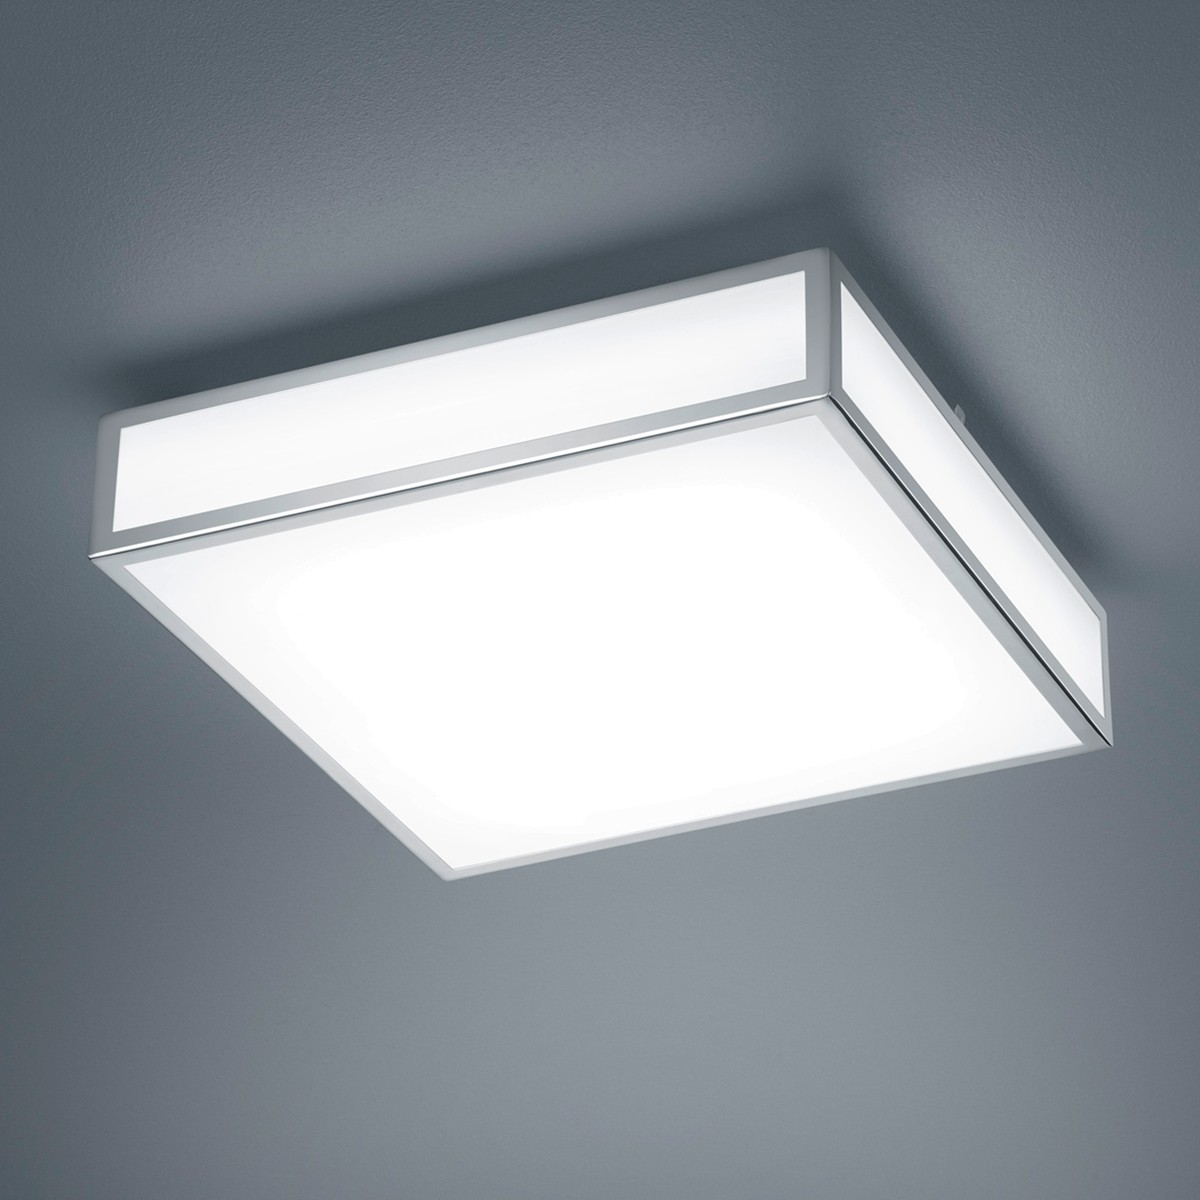 Helestra Zelo LED Deckenleuchte, eckig, 30 x 30 cm, Chrom